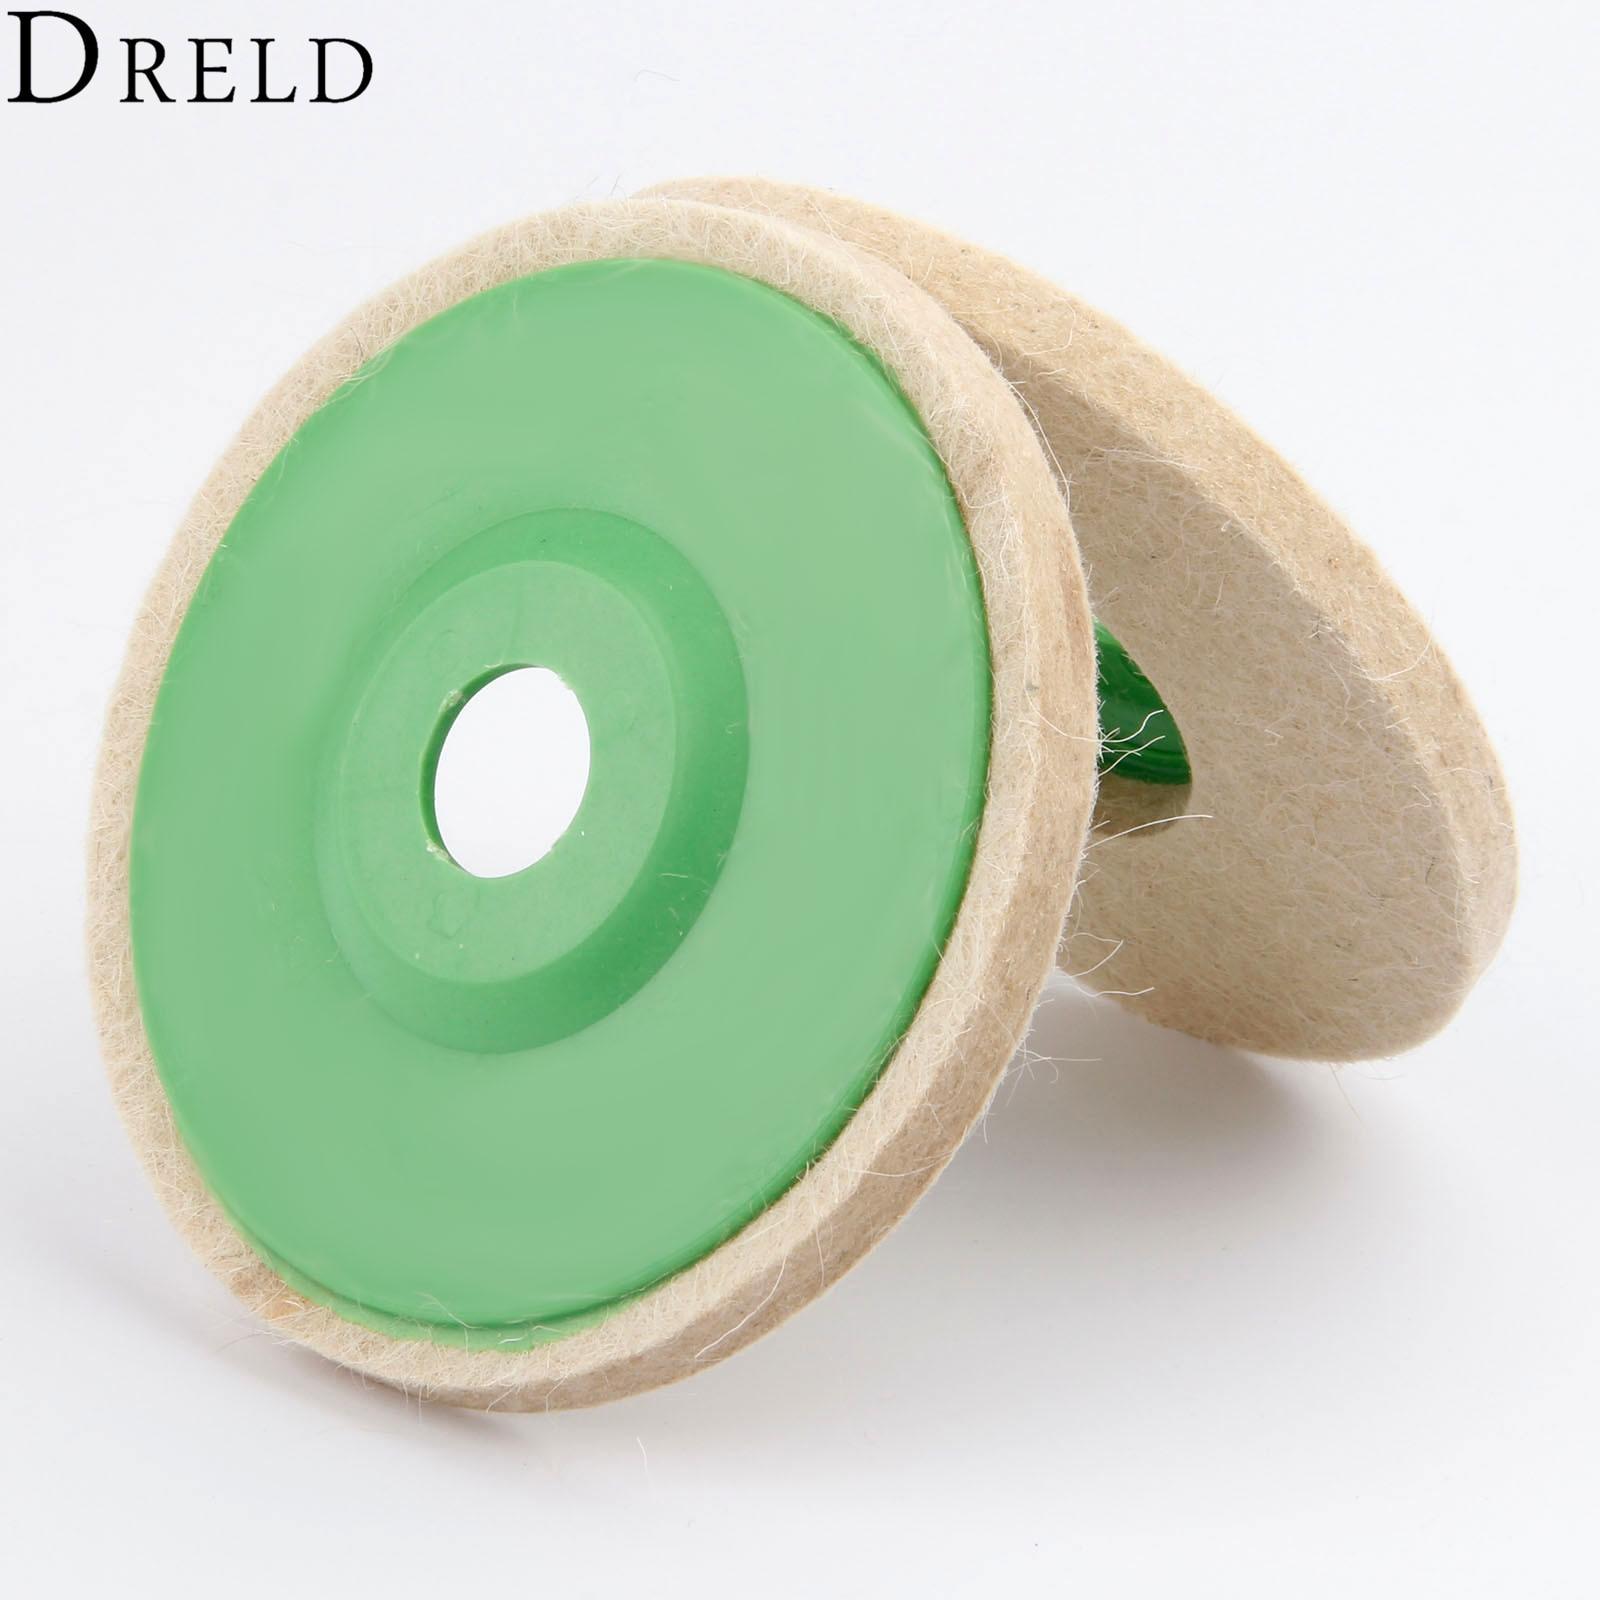 DRELD 1Pc Dremel Accessories 5 Inch 125mm Round Polishing Wheel Wool Felt Buffing Polishers Pad Buffer Tools For Metal Marble